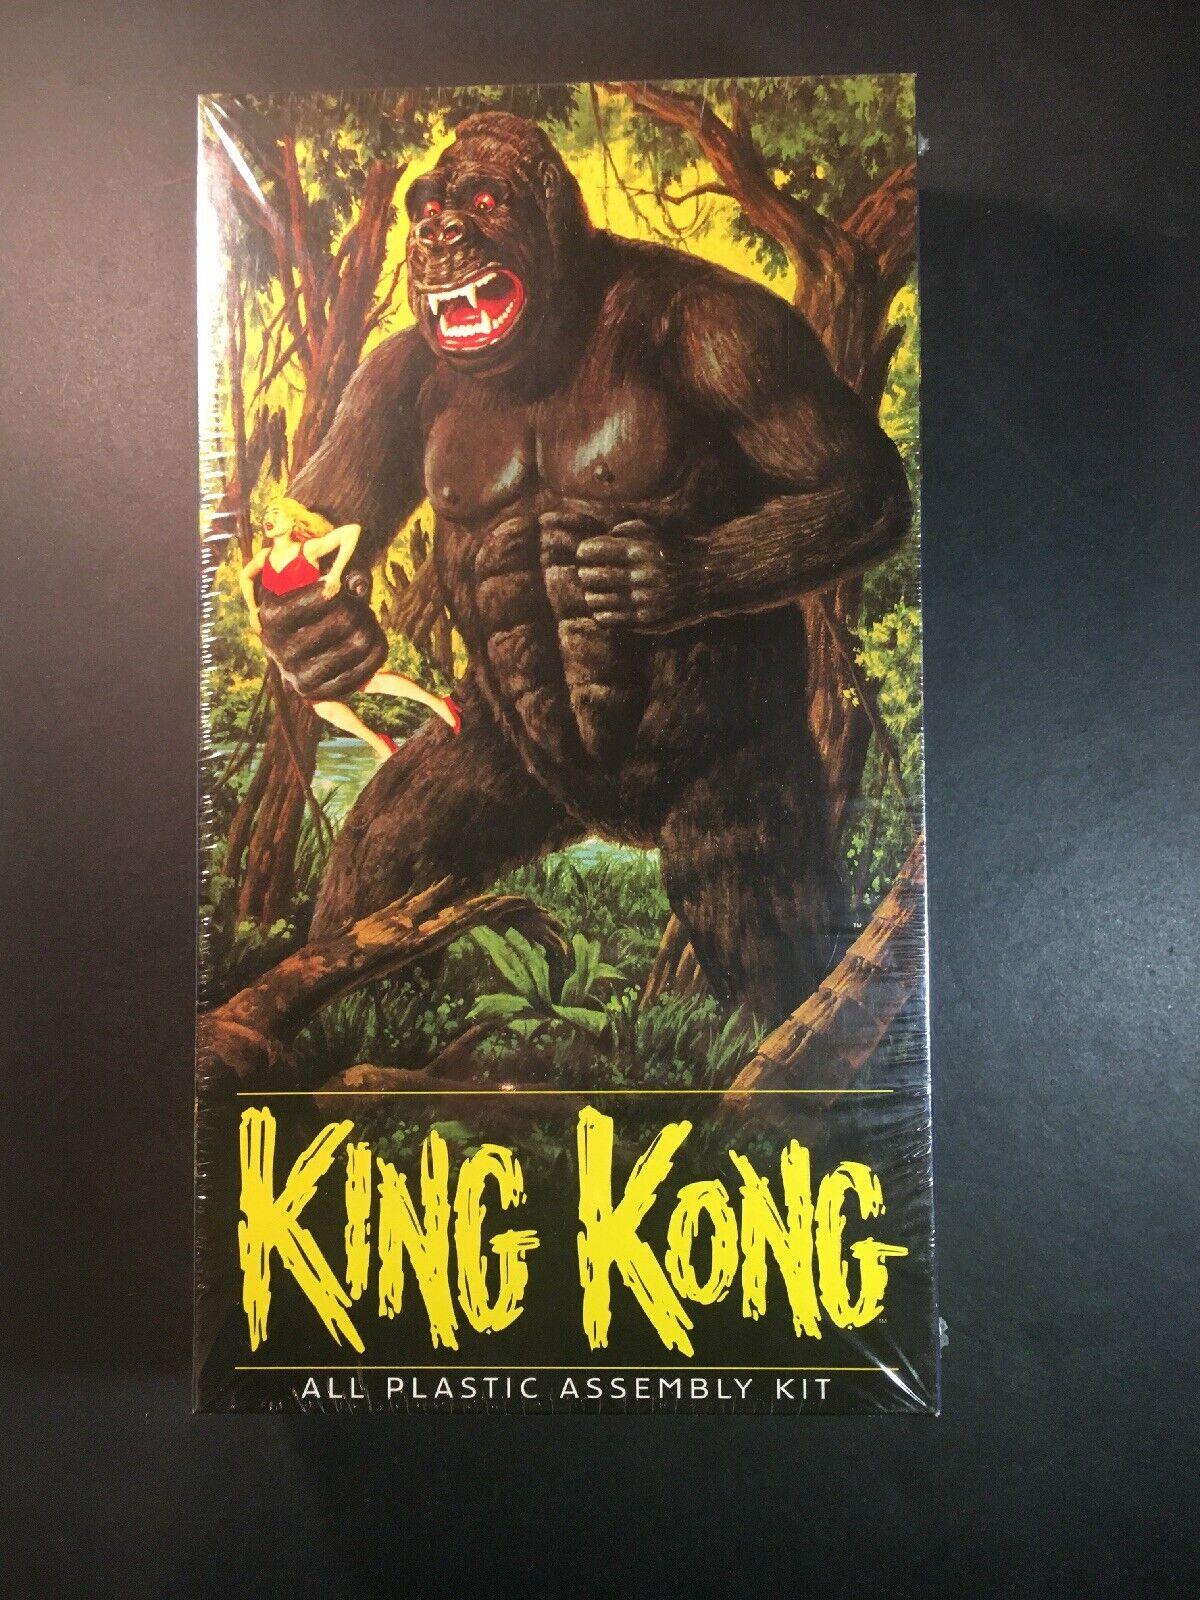 King Kong All Plastic Assembly Kit Aurora 2000 New Sealed Box